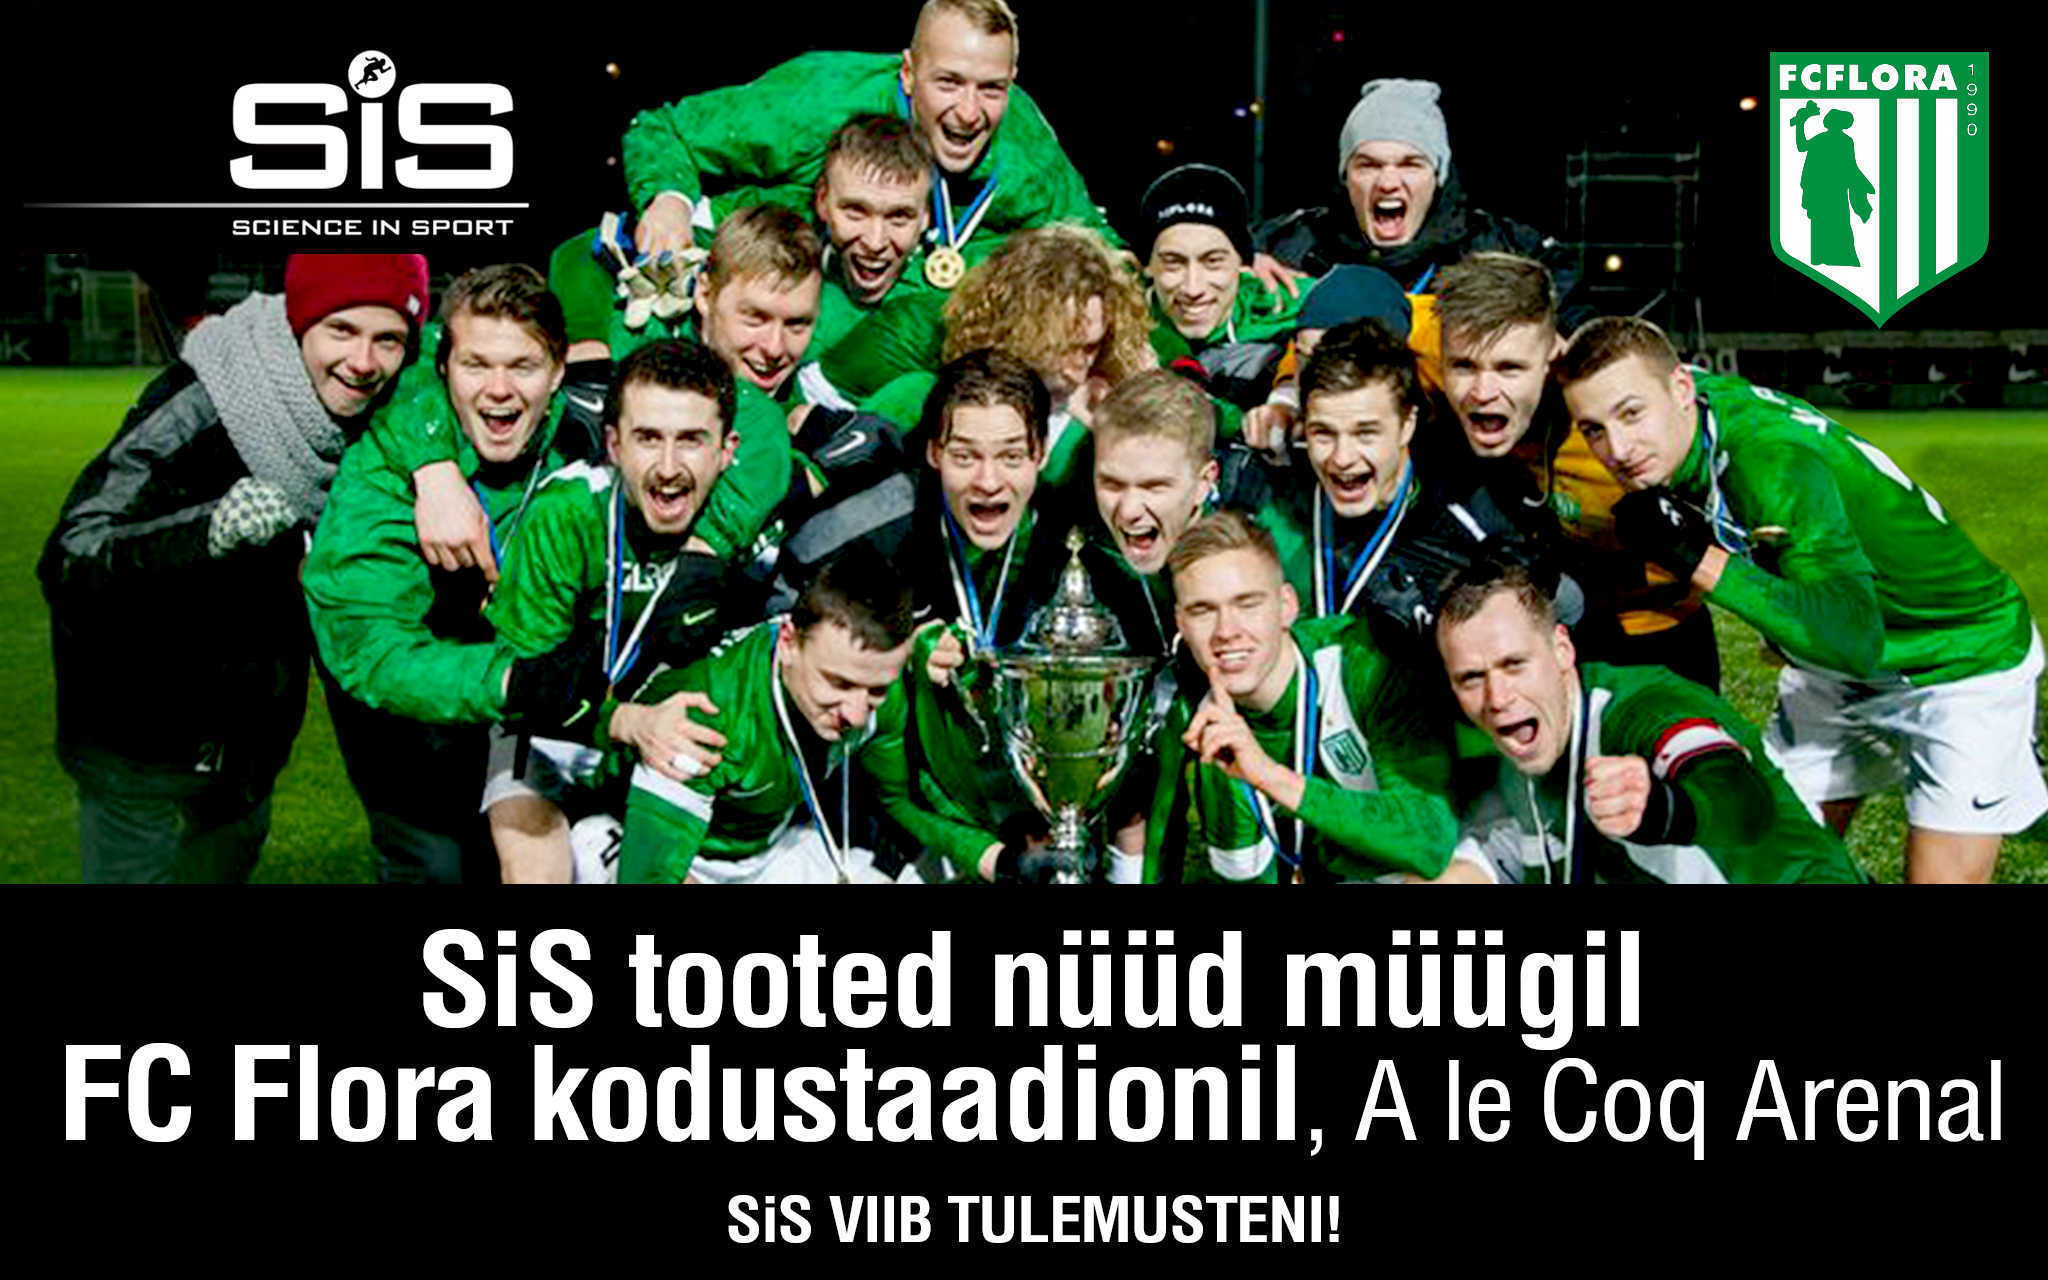 SiS_sp14_FB FCFlora